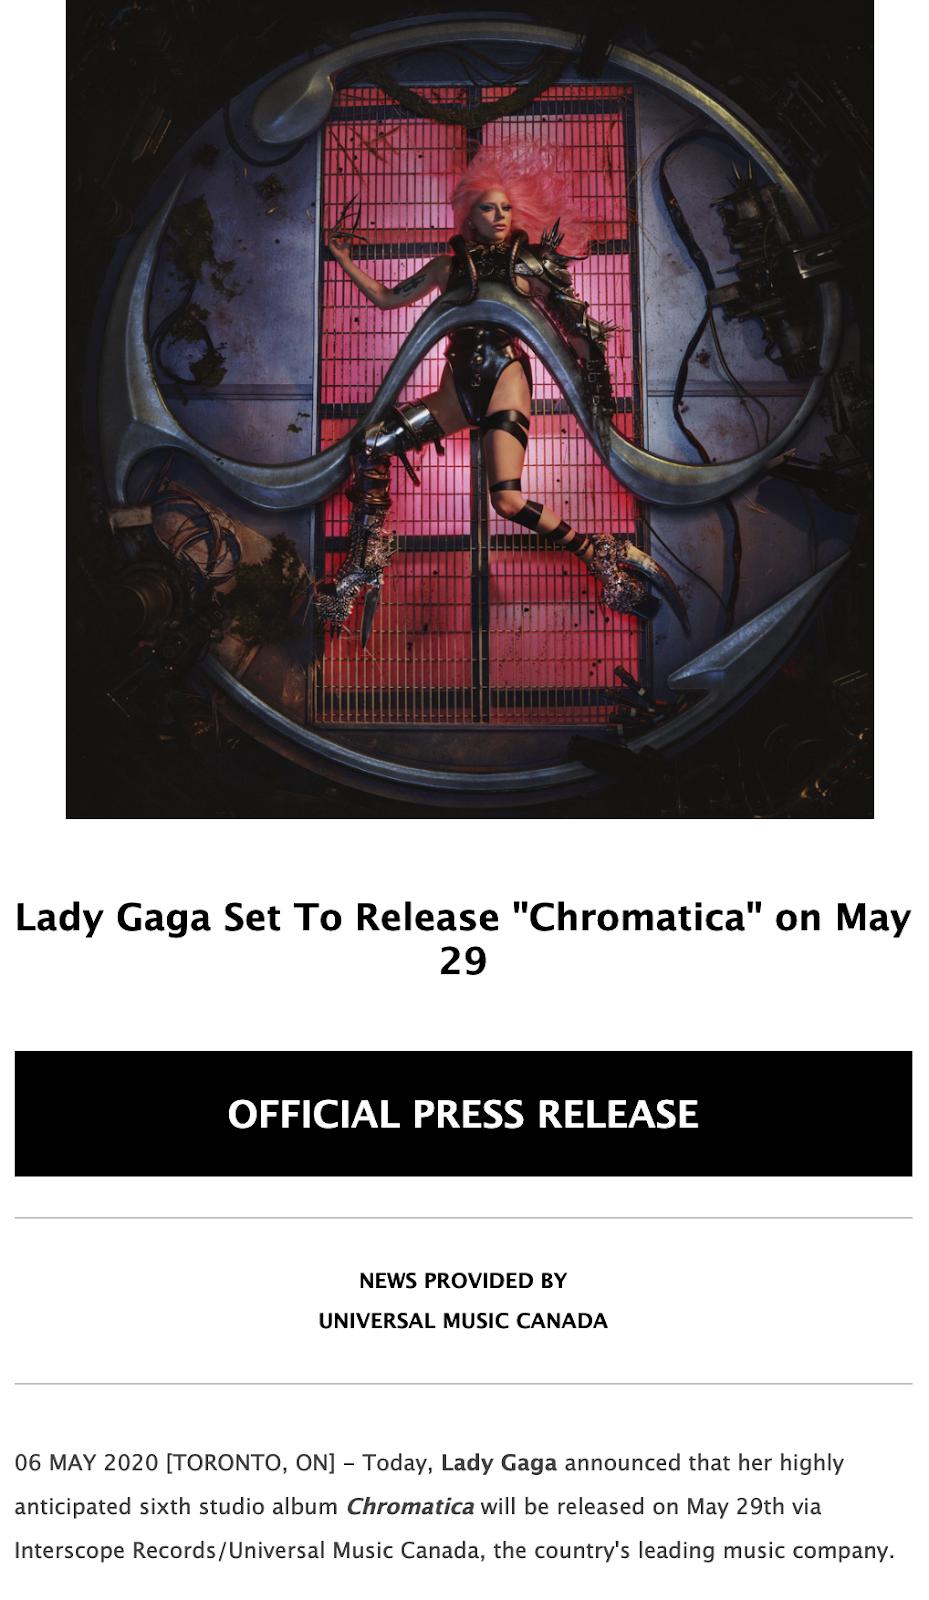 Lady Gaga press release